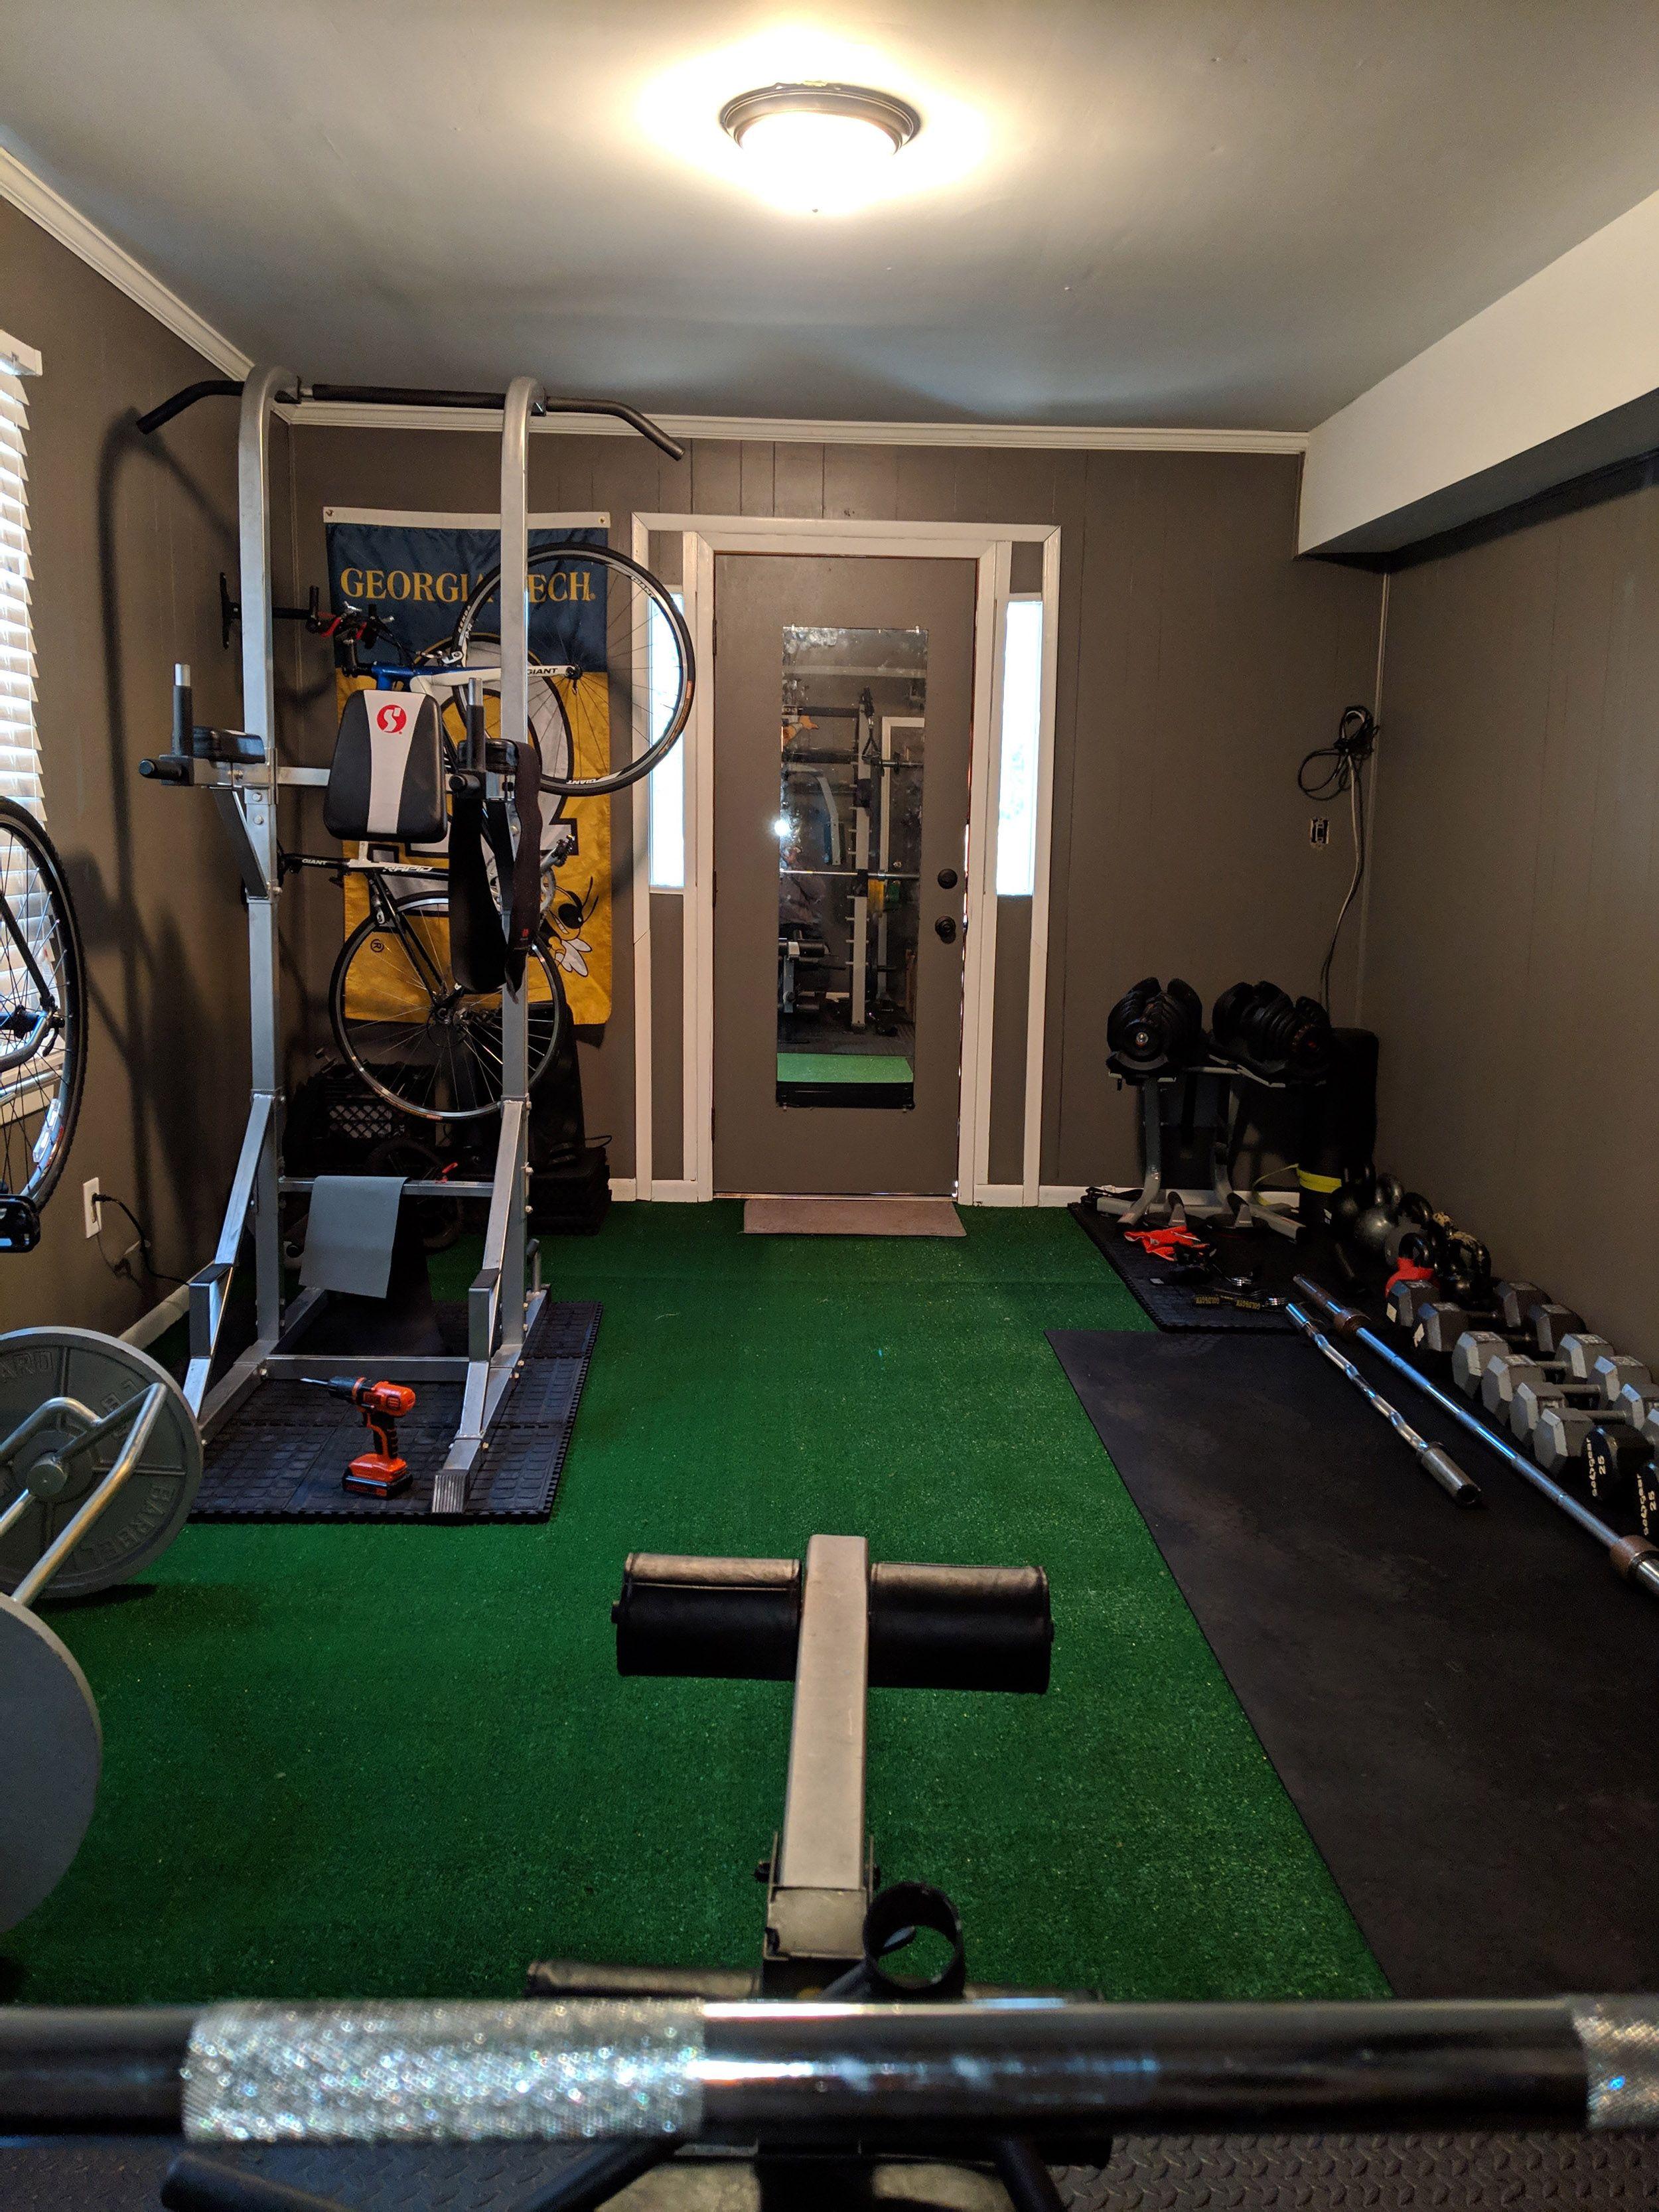 Rubber Flooring Rolls 1/4 Inch 4x10 Ft Black in 2020 Diy